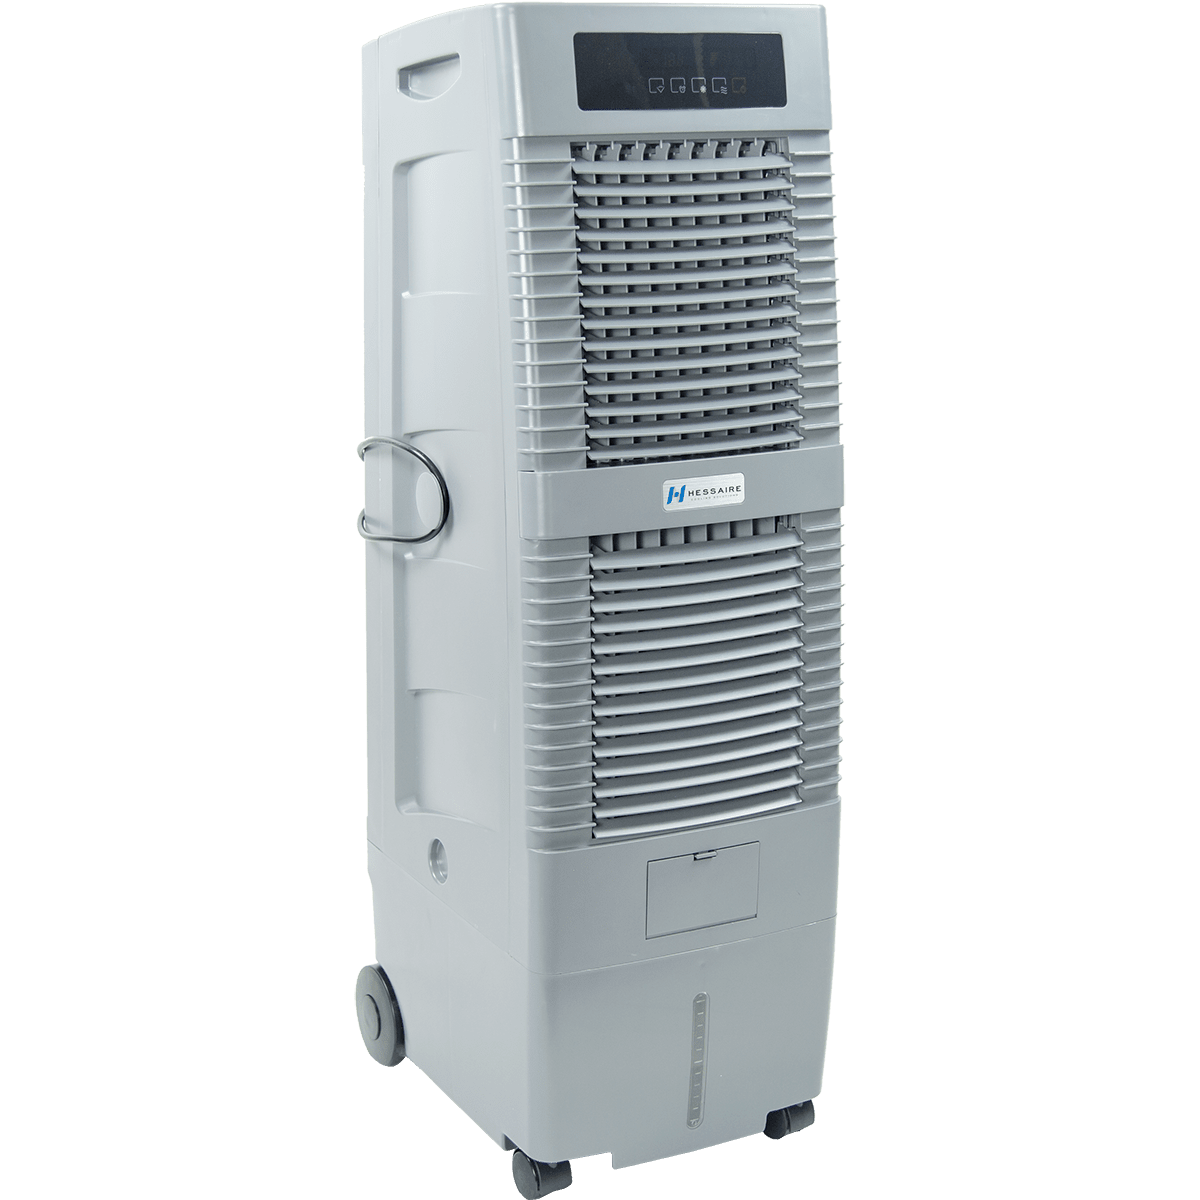 Hessaire MC21A 2,100 CFM Evaporative Cooler he6349